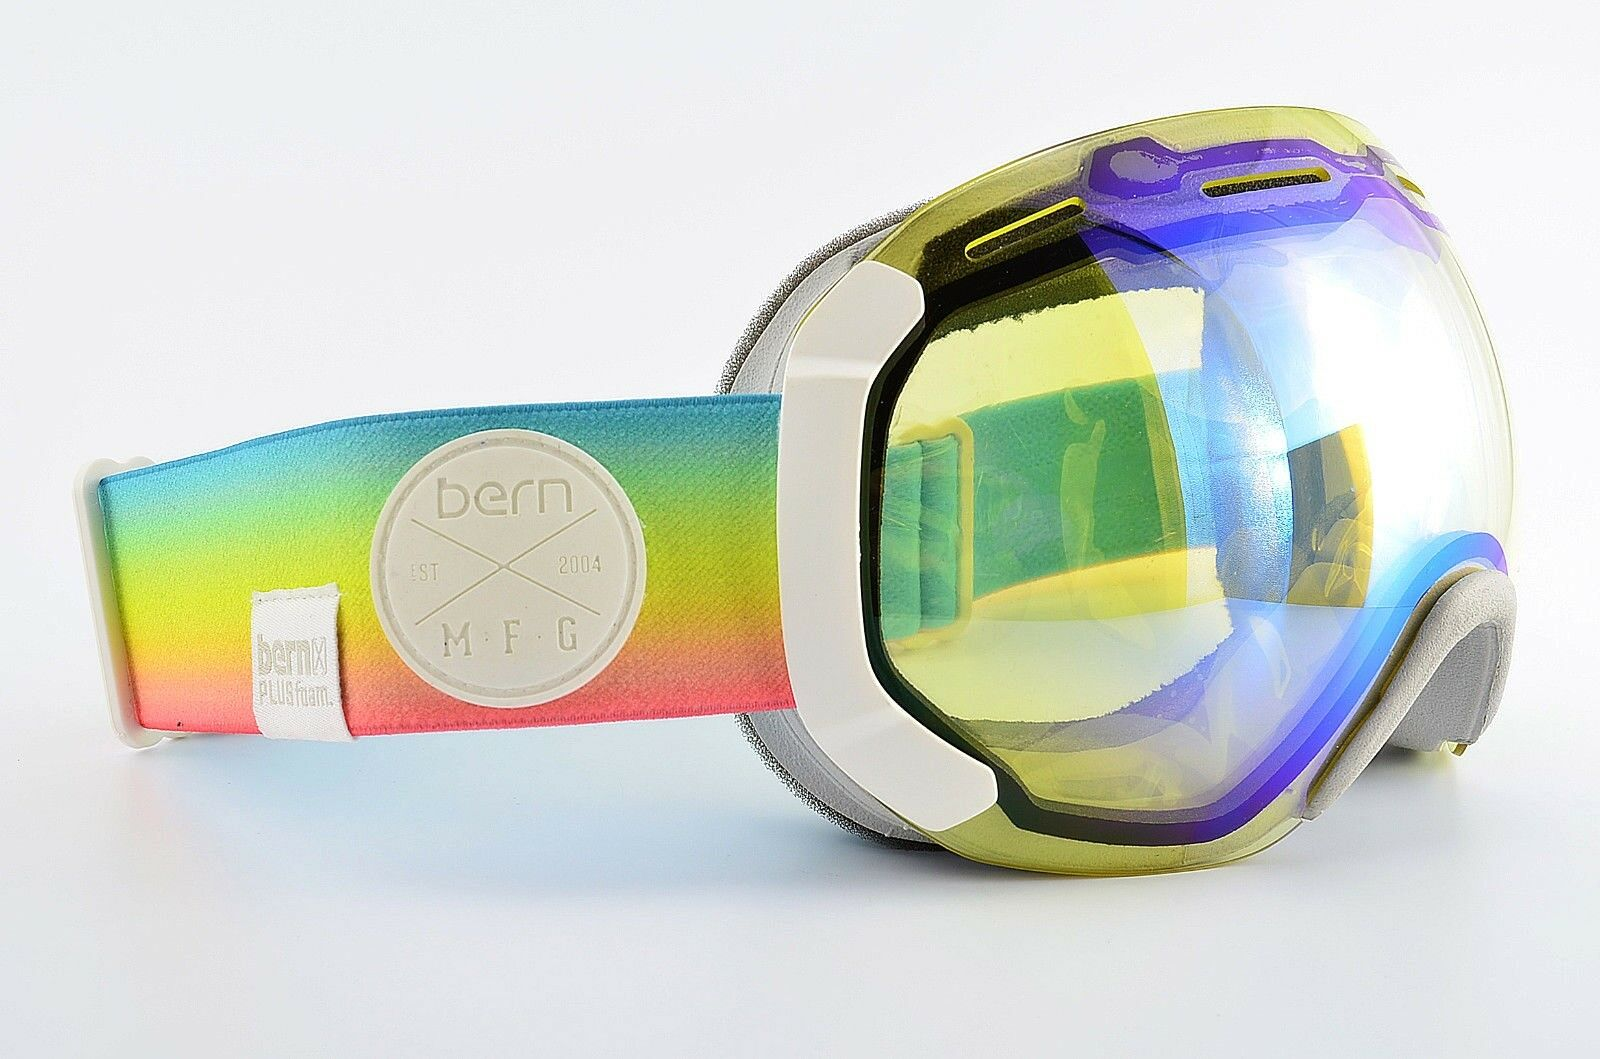 Bern Ski Brille Modell Pulsfoam MFG Snowbard Sport Ski Mask NOS color Rainbow